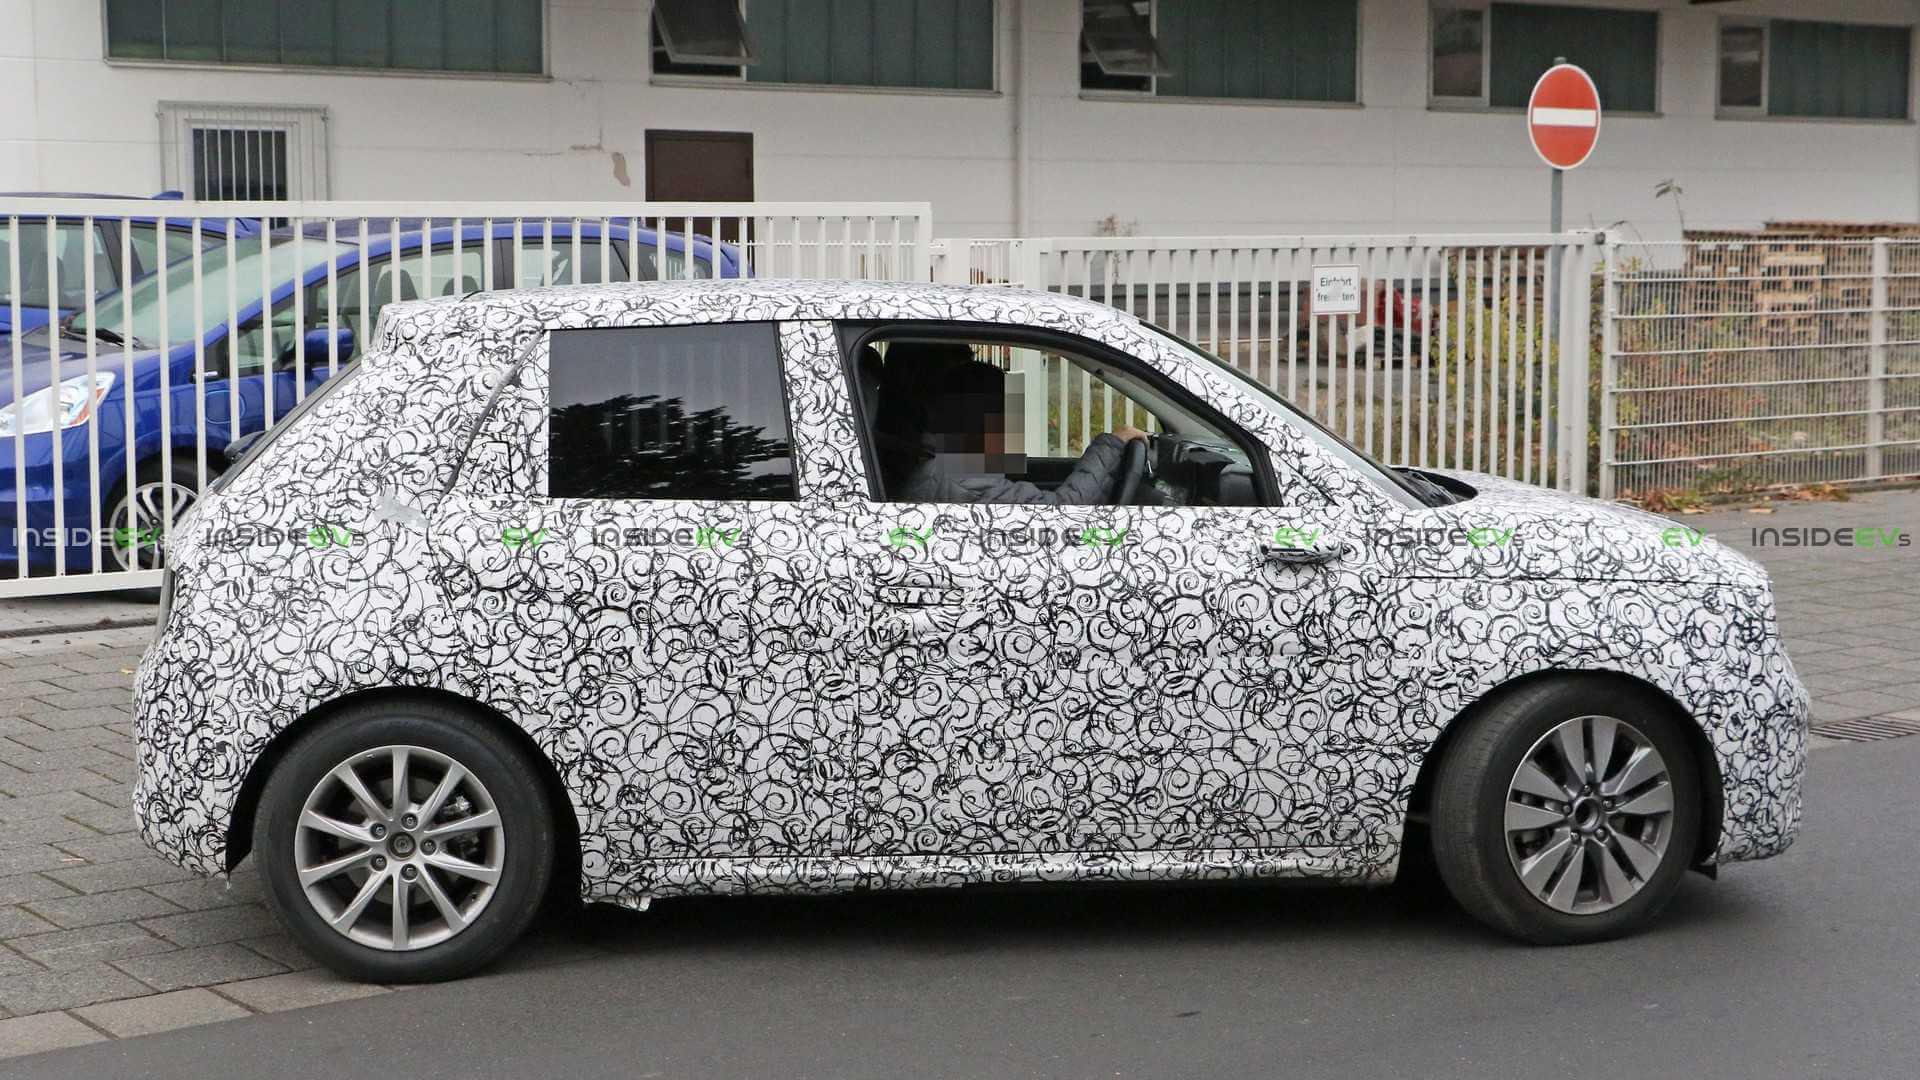 4-х дверный электромобиль Honda Urban EV на тестировании